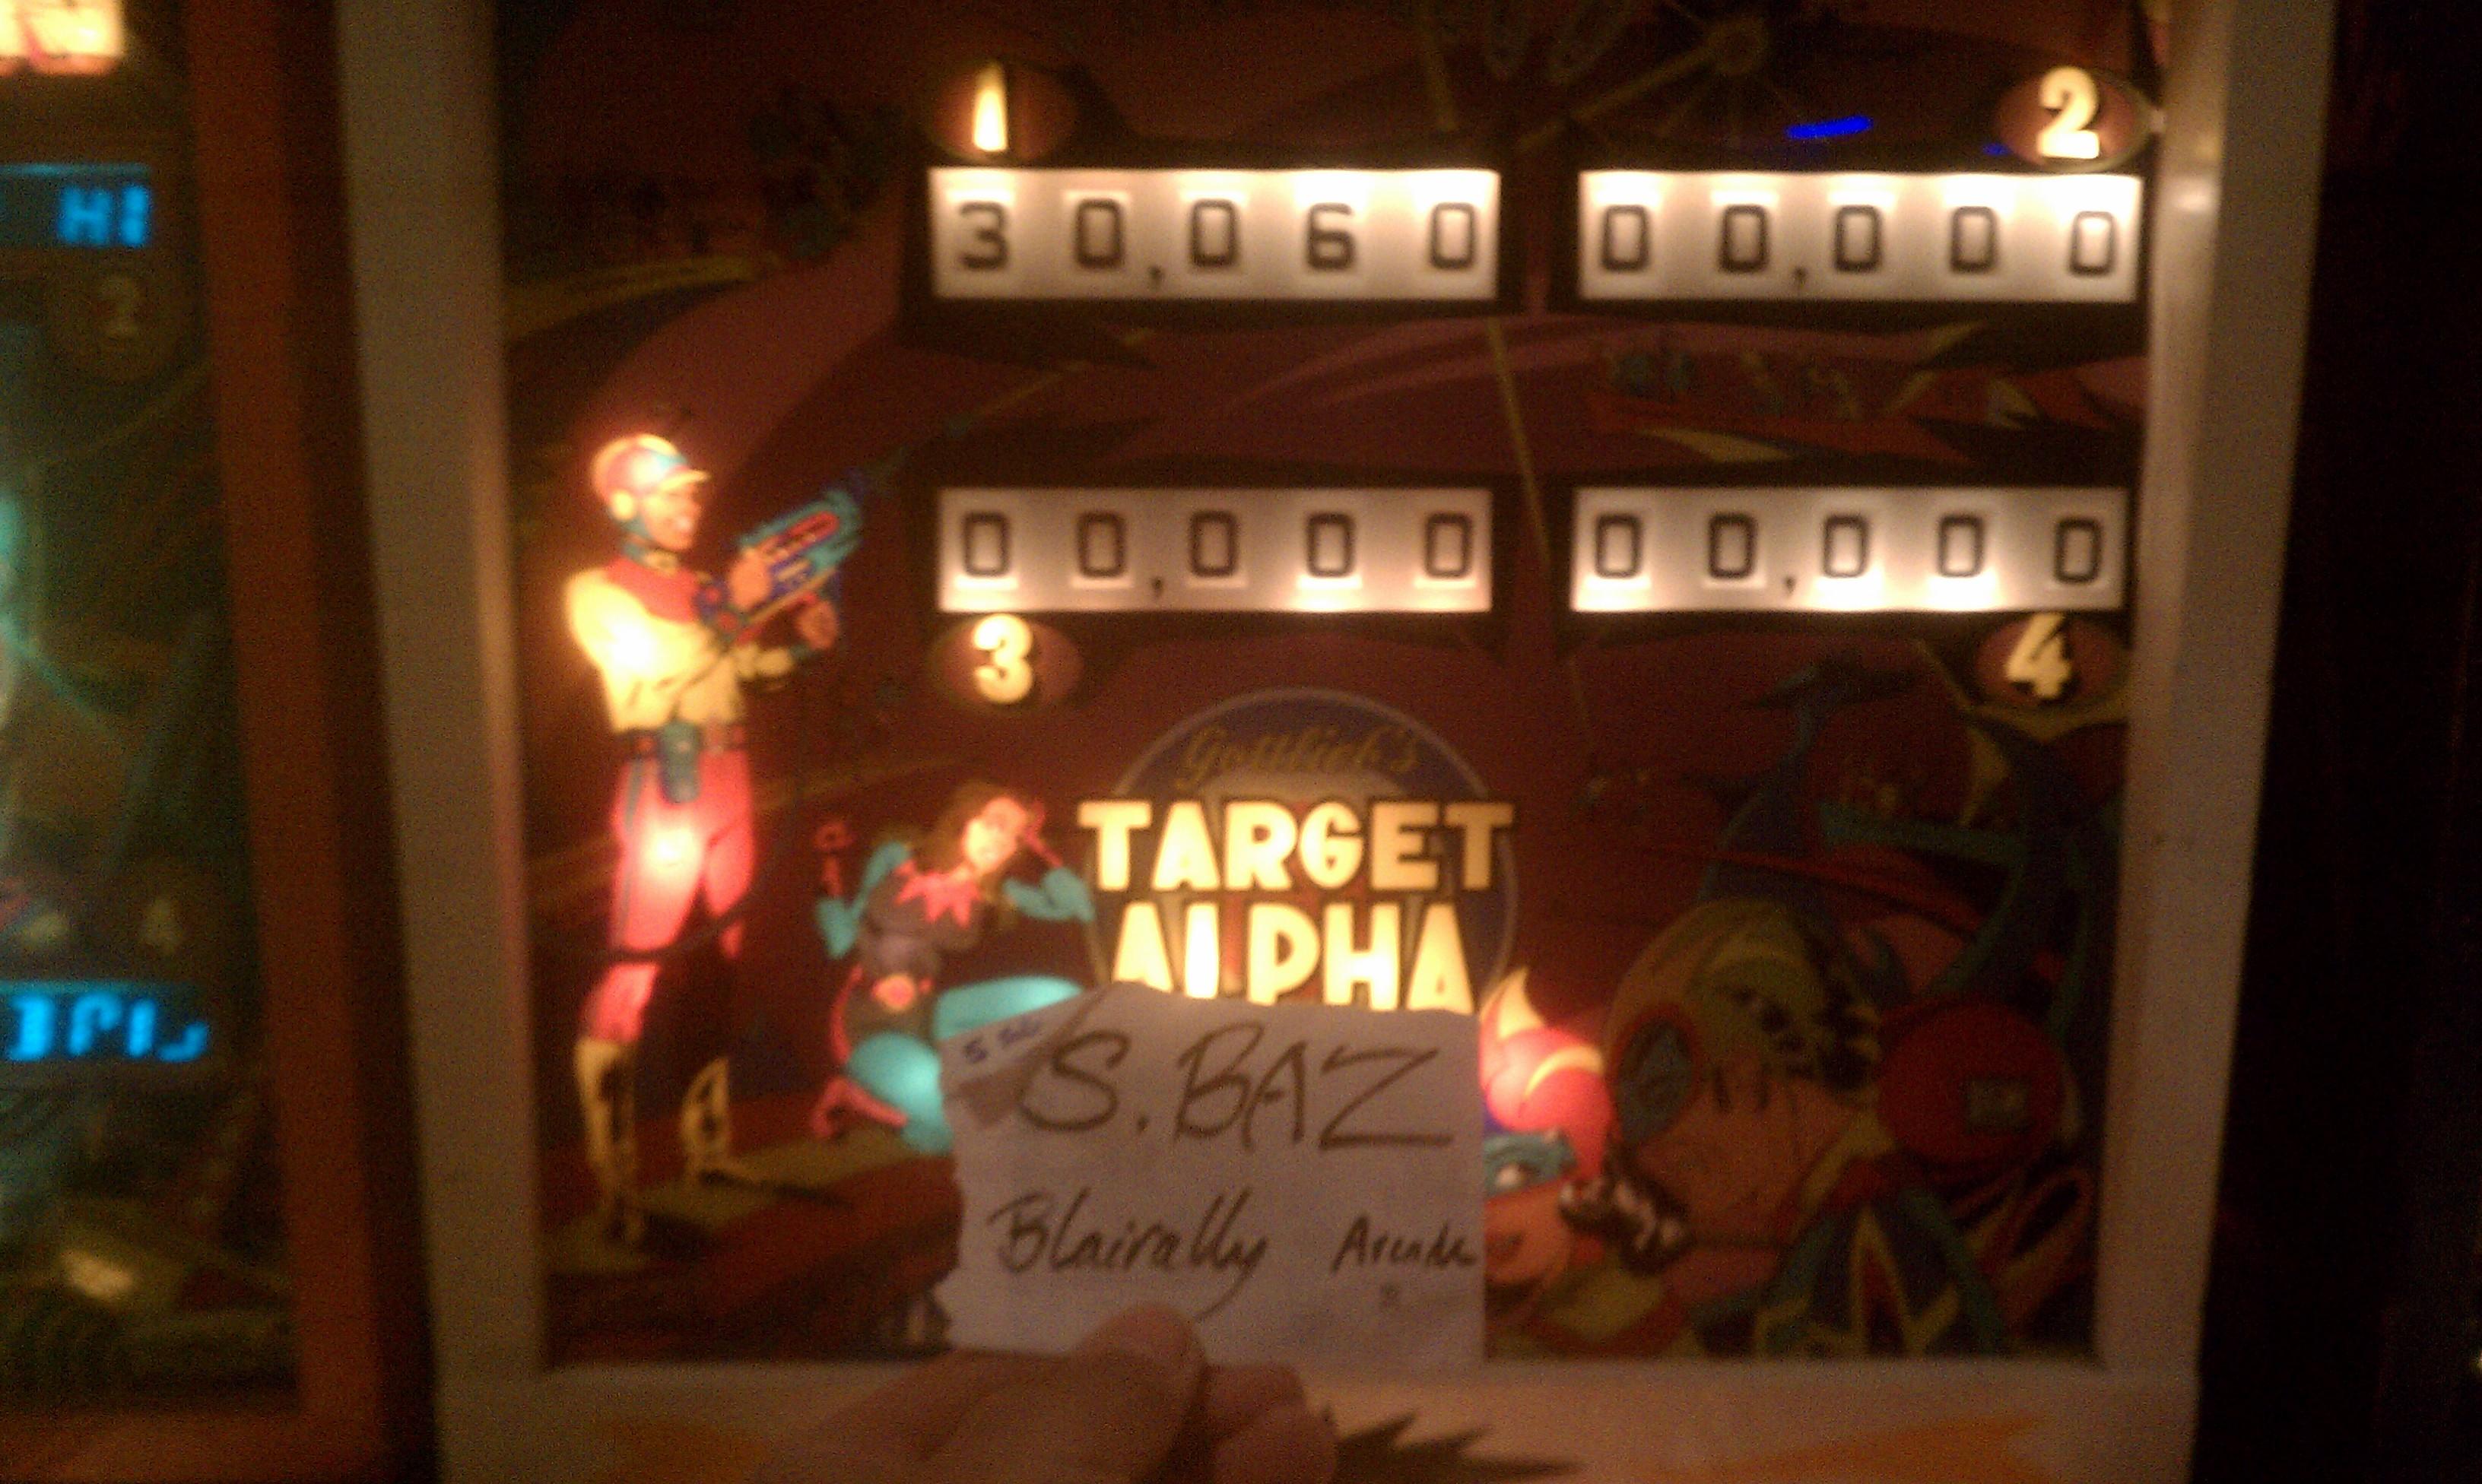 S.BAZ: Target Alpha (Pinball: 5 Balls) 30,060 points on 2019-11-24 19:37:38